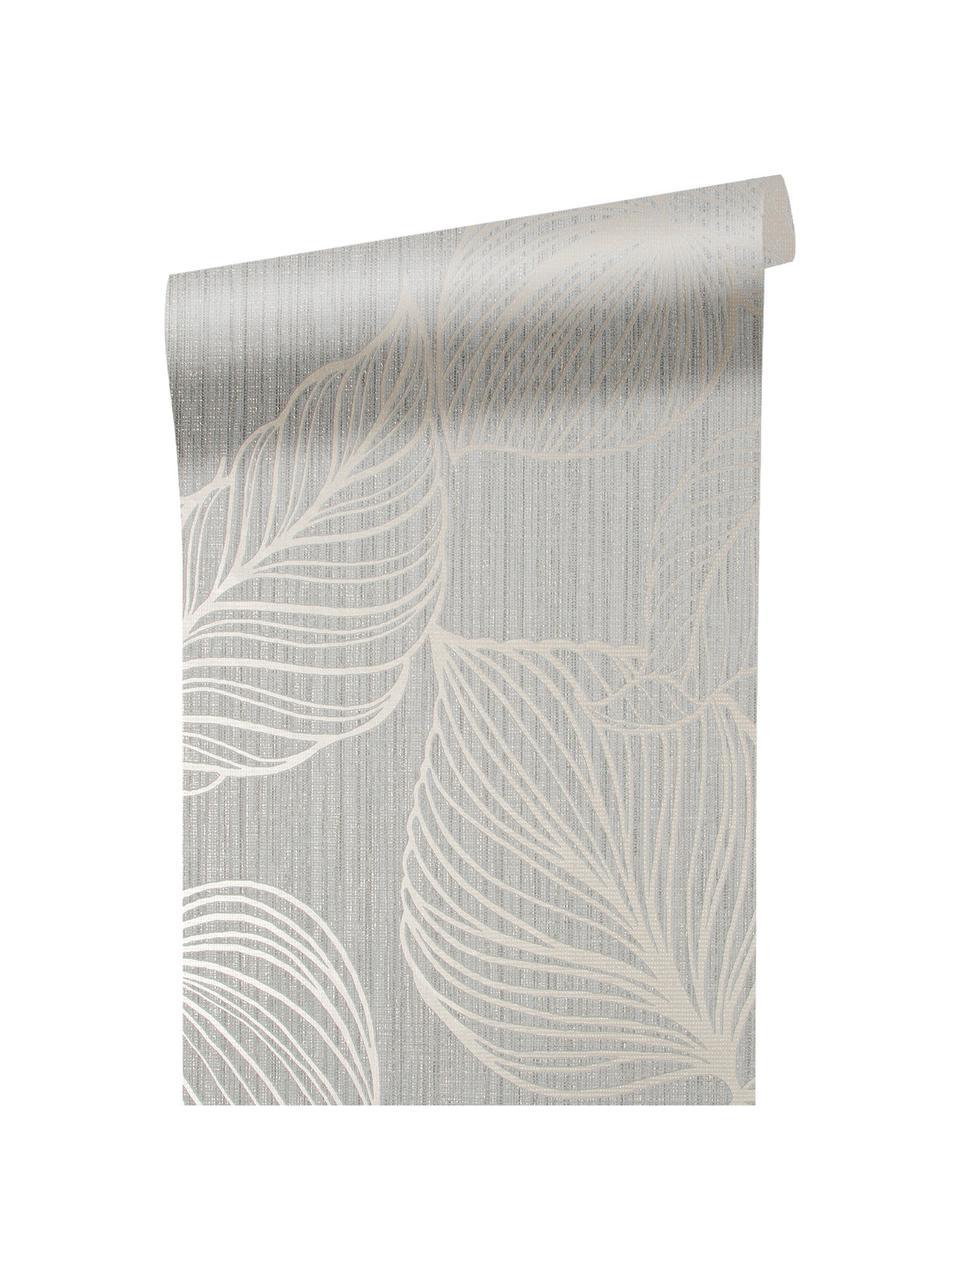 Carta da parati Luxus Fine Blatter, Tessuto non tessuto, Argentato, grigio, Larg. 52 x Alt. 1005 cm